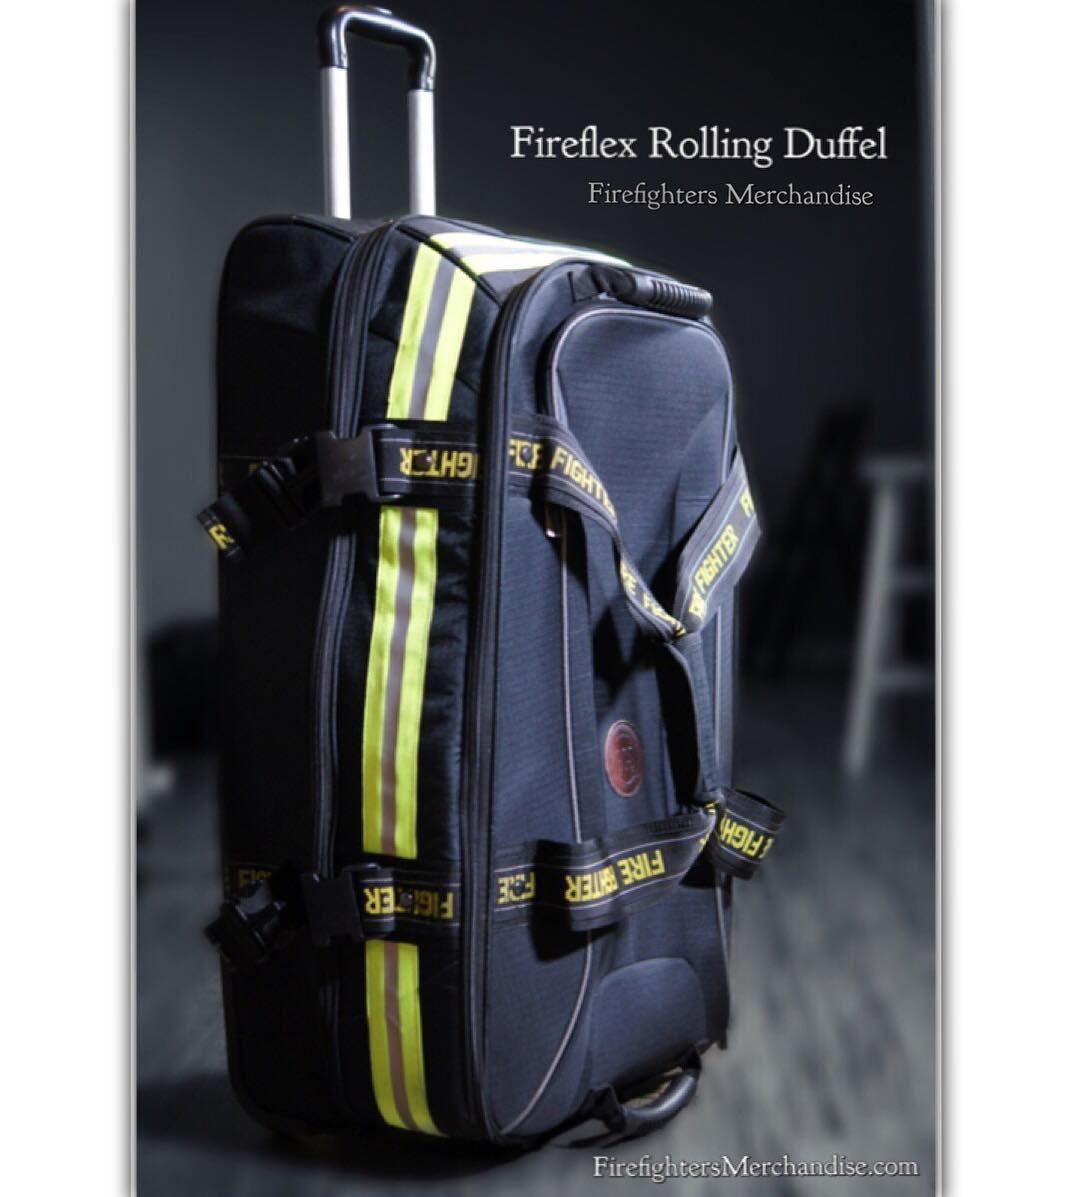 02e21a5cc013 Fireflex Rolling Duffel Bag - COMING SOON! (Click link in bio)  FFM   firefightersmerchandise  GCS